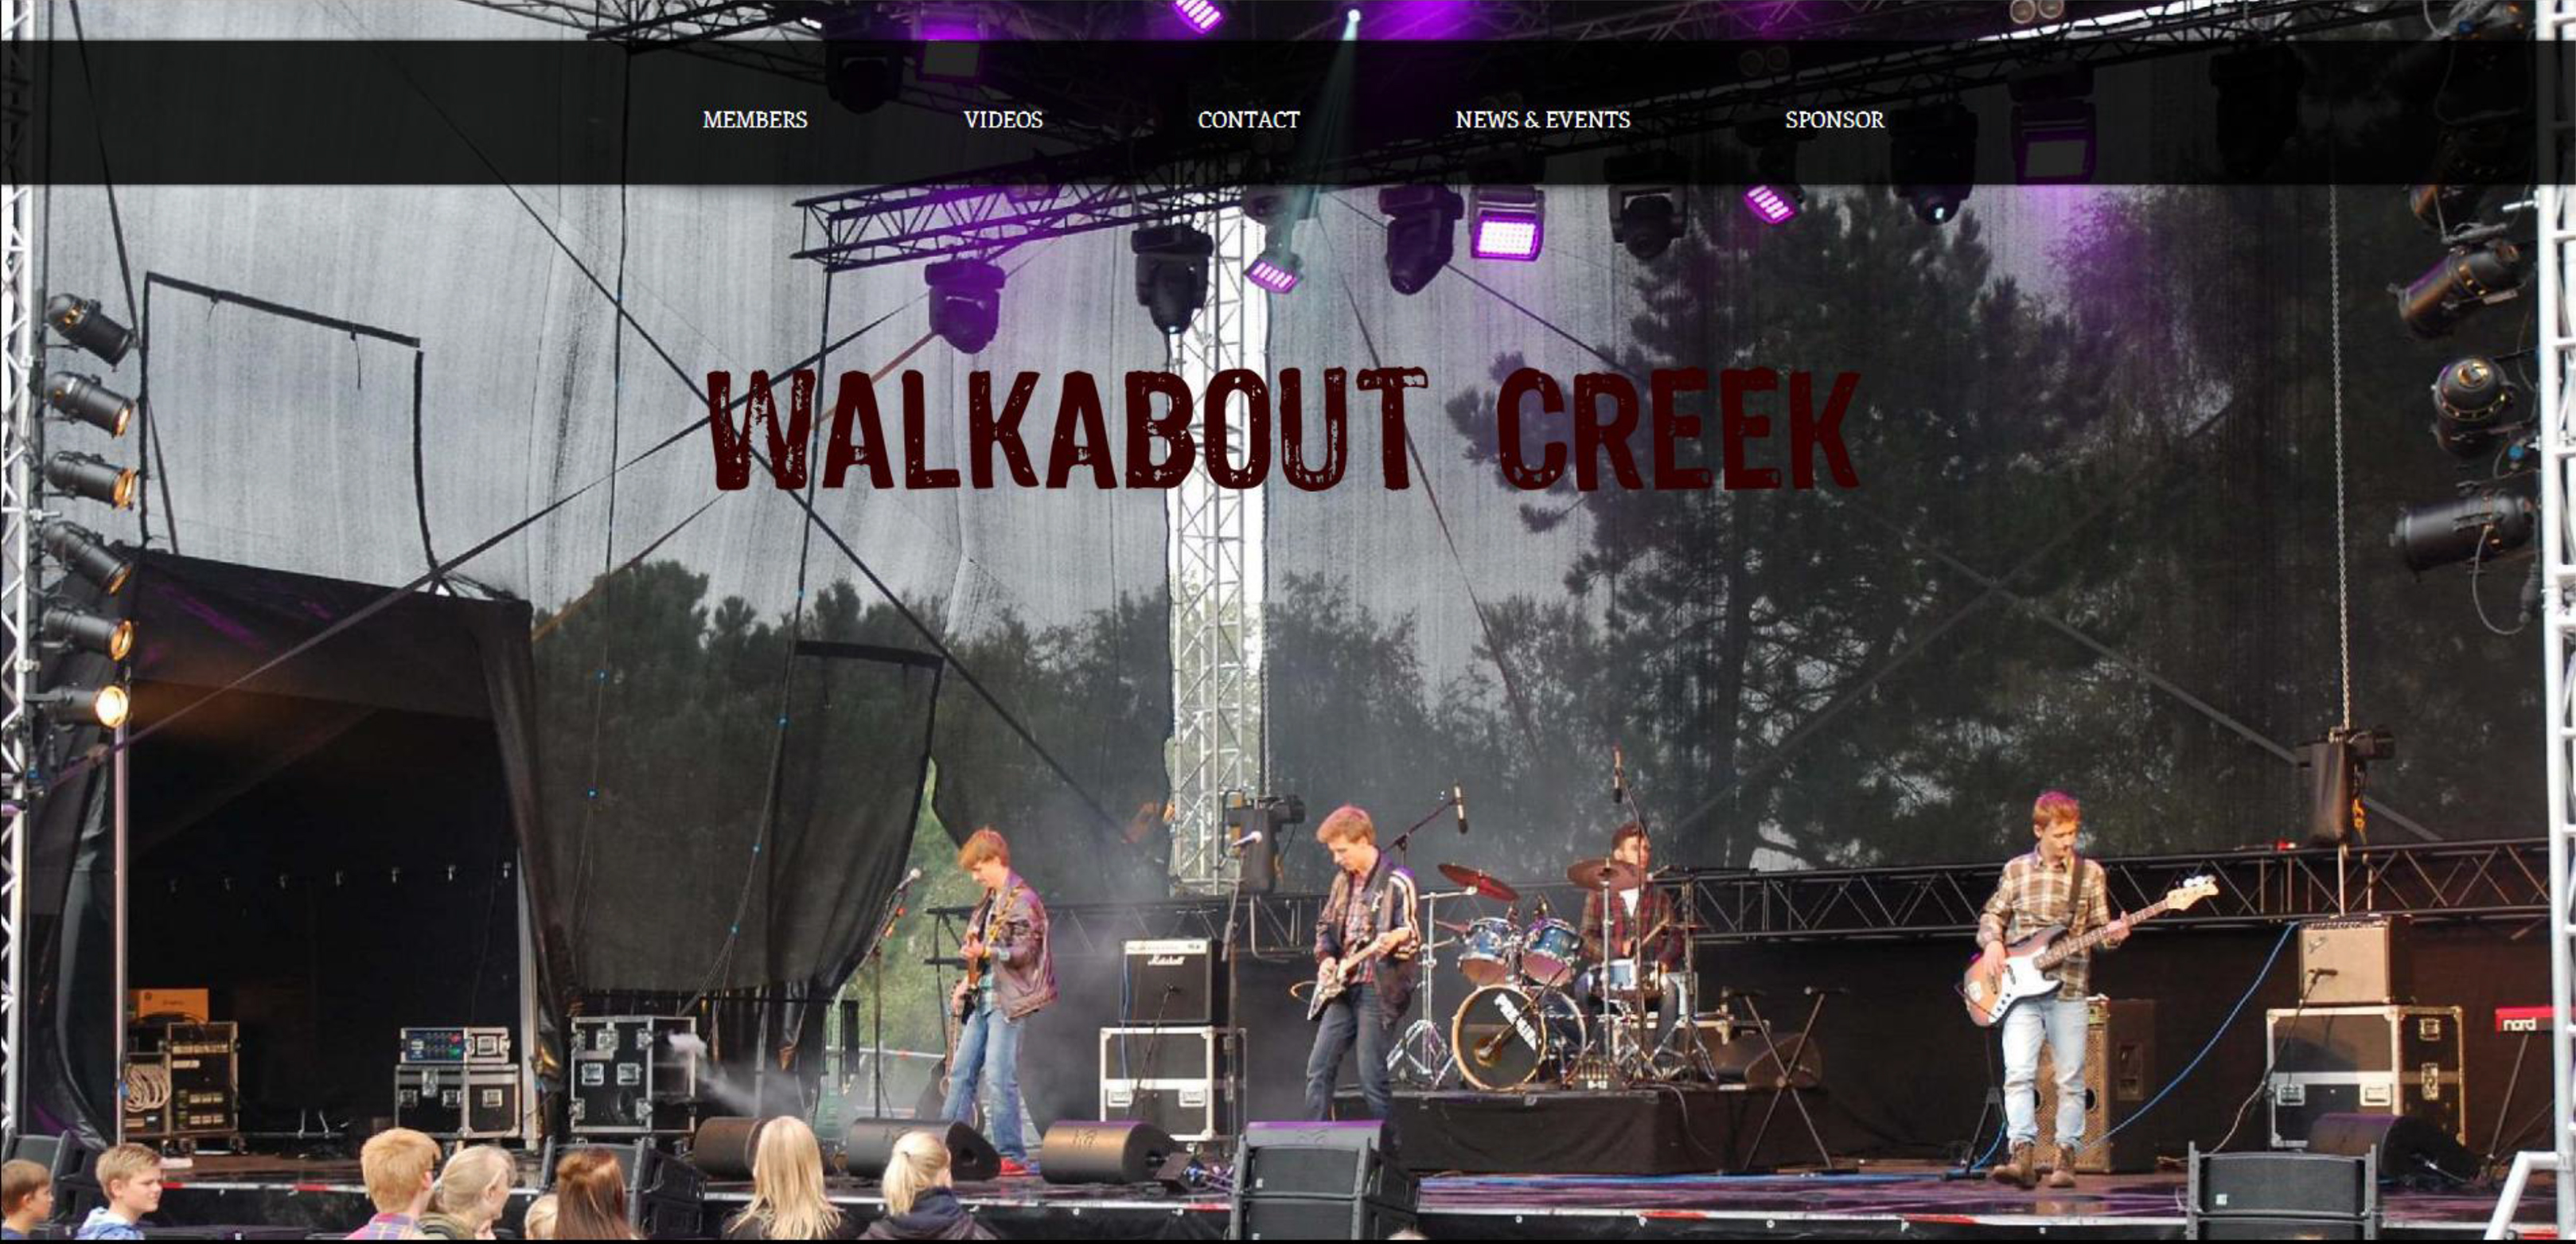 Walkabout Creek